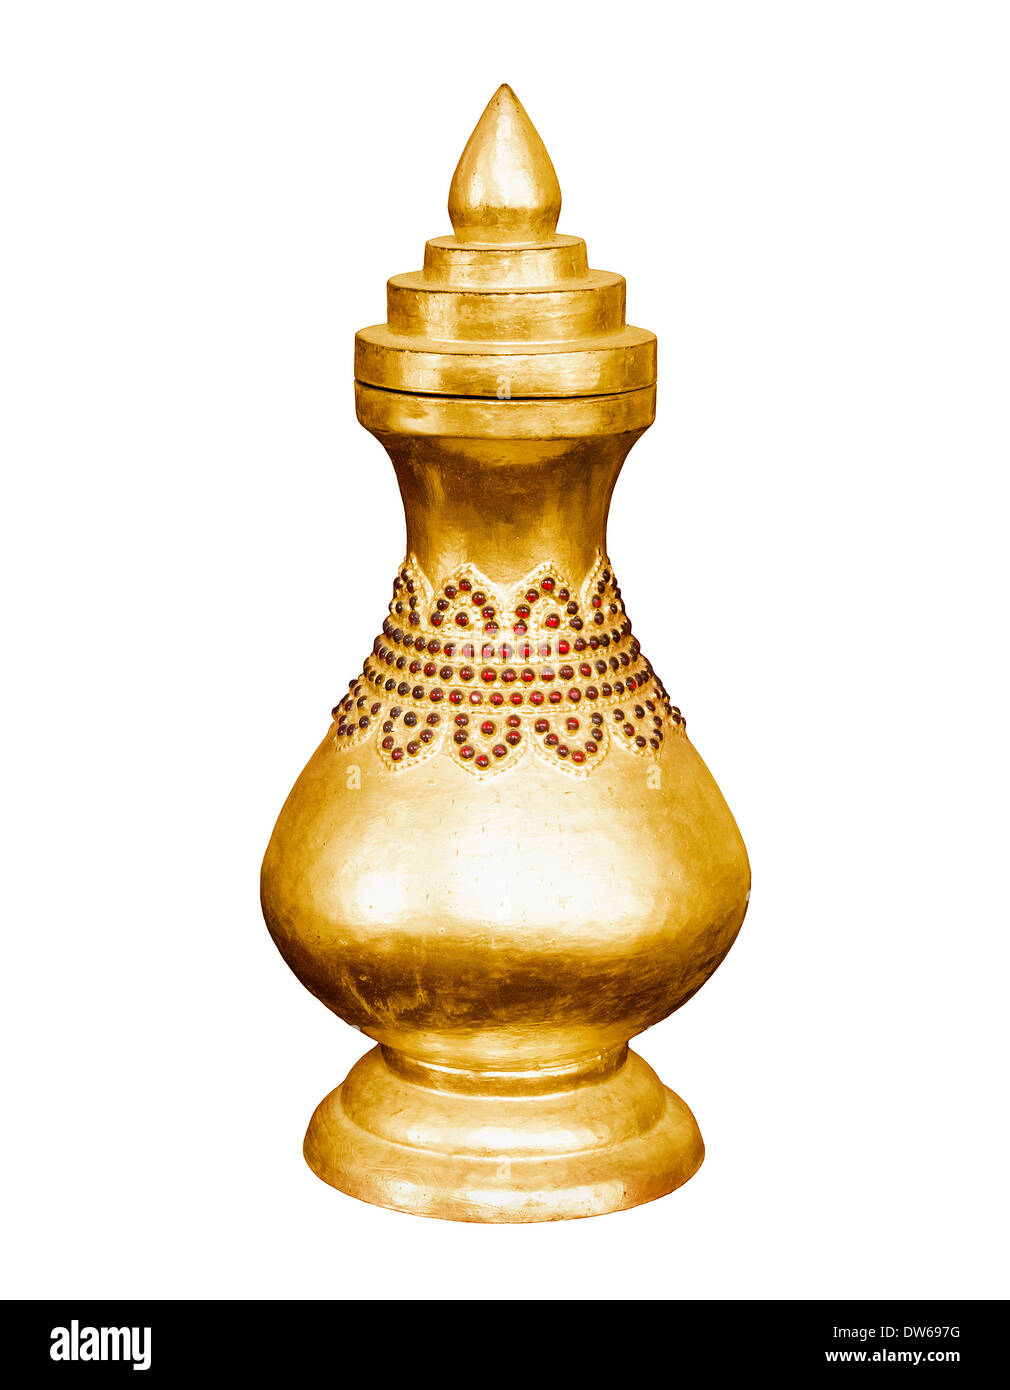 Vintage golden vessel isolated on white background. Myanmar, Mandalay Stock Photo